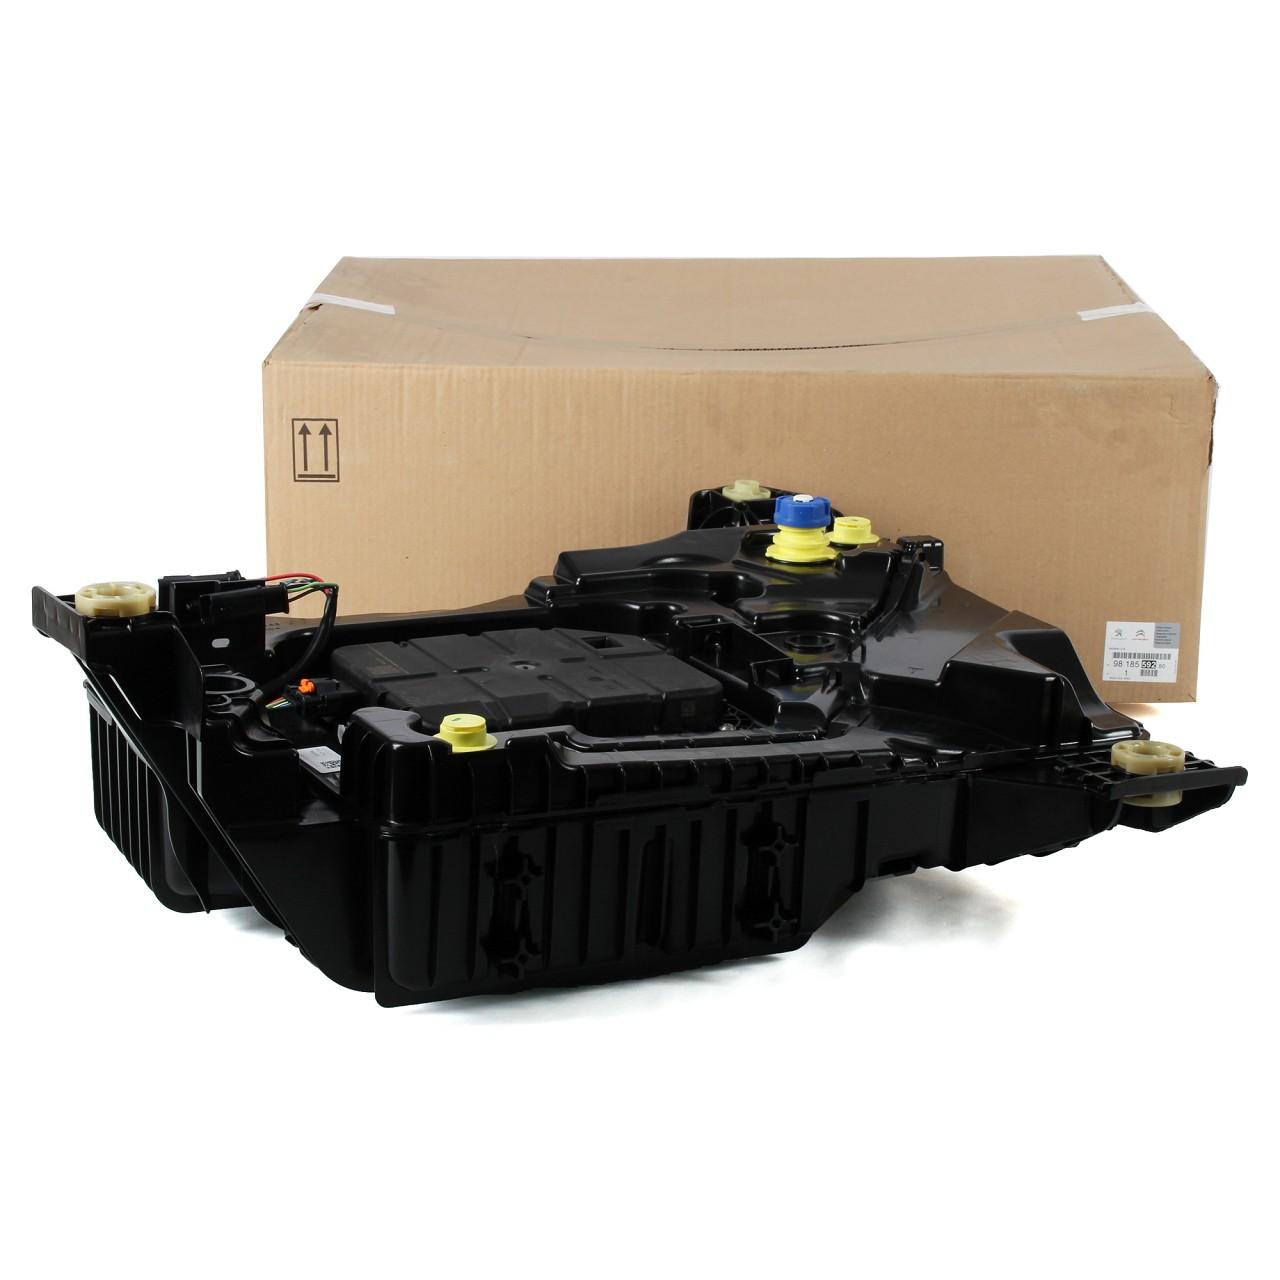 ORIGINAL PSA Tank Kraftstoffadditiv C4 Picasso II / Spacetourer 1.6/2.0 BlueHDi 9818559280